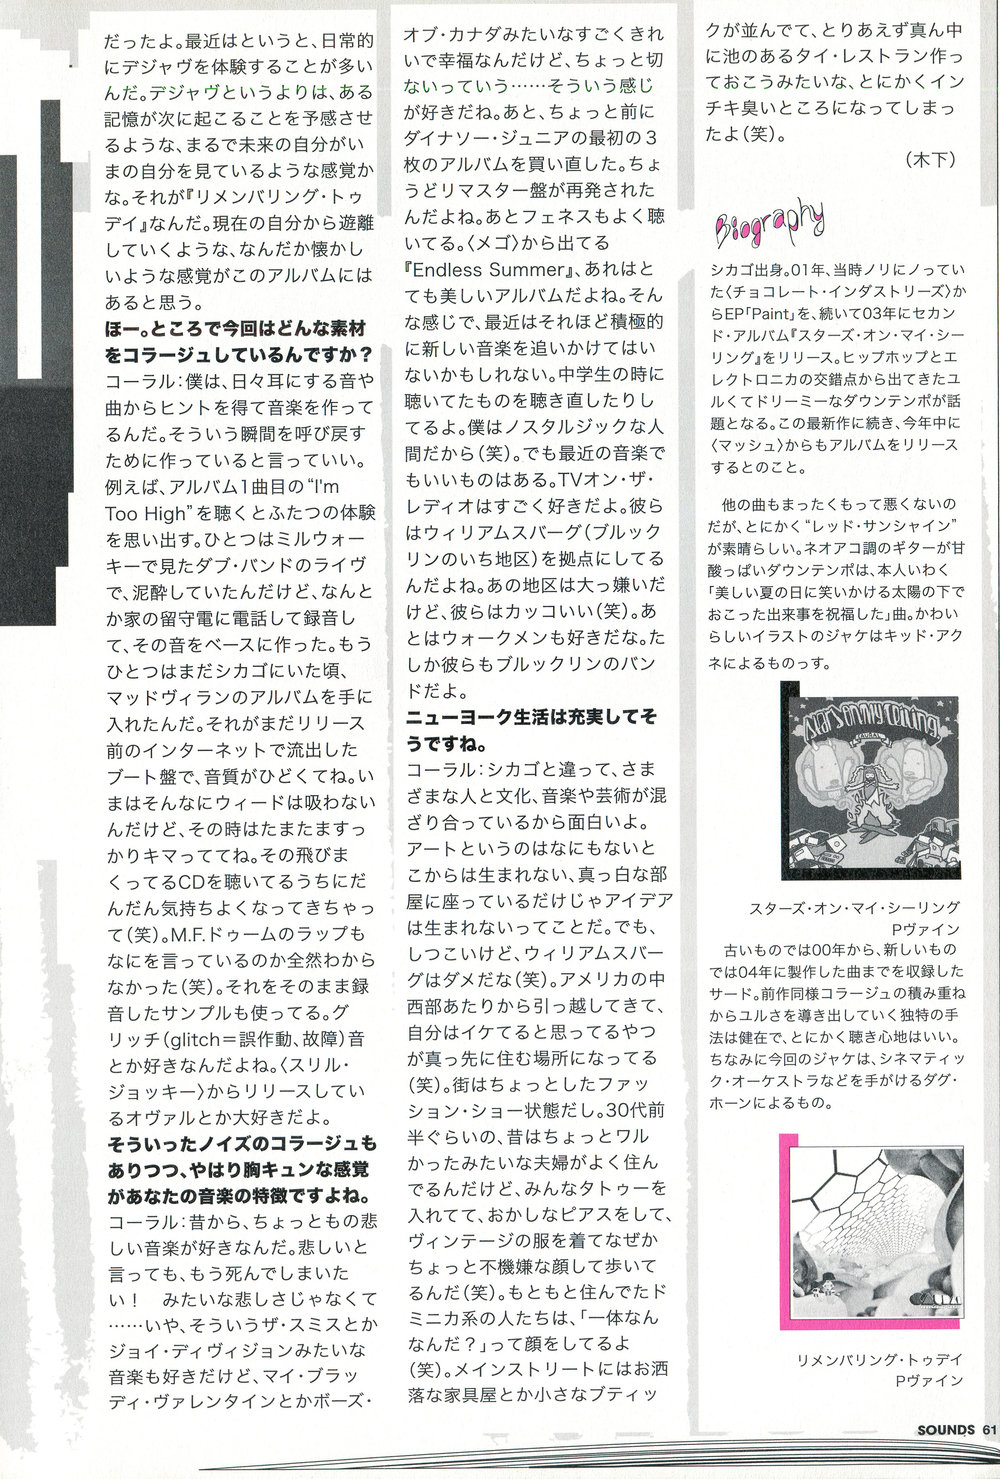 Remix Magazine - November 2005 - Issue 173 - Caural Interview - 2_SMALL.jpg